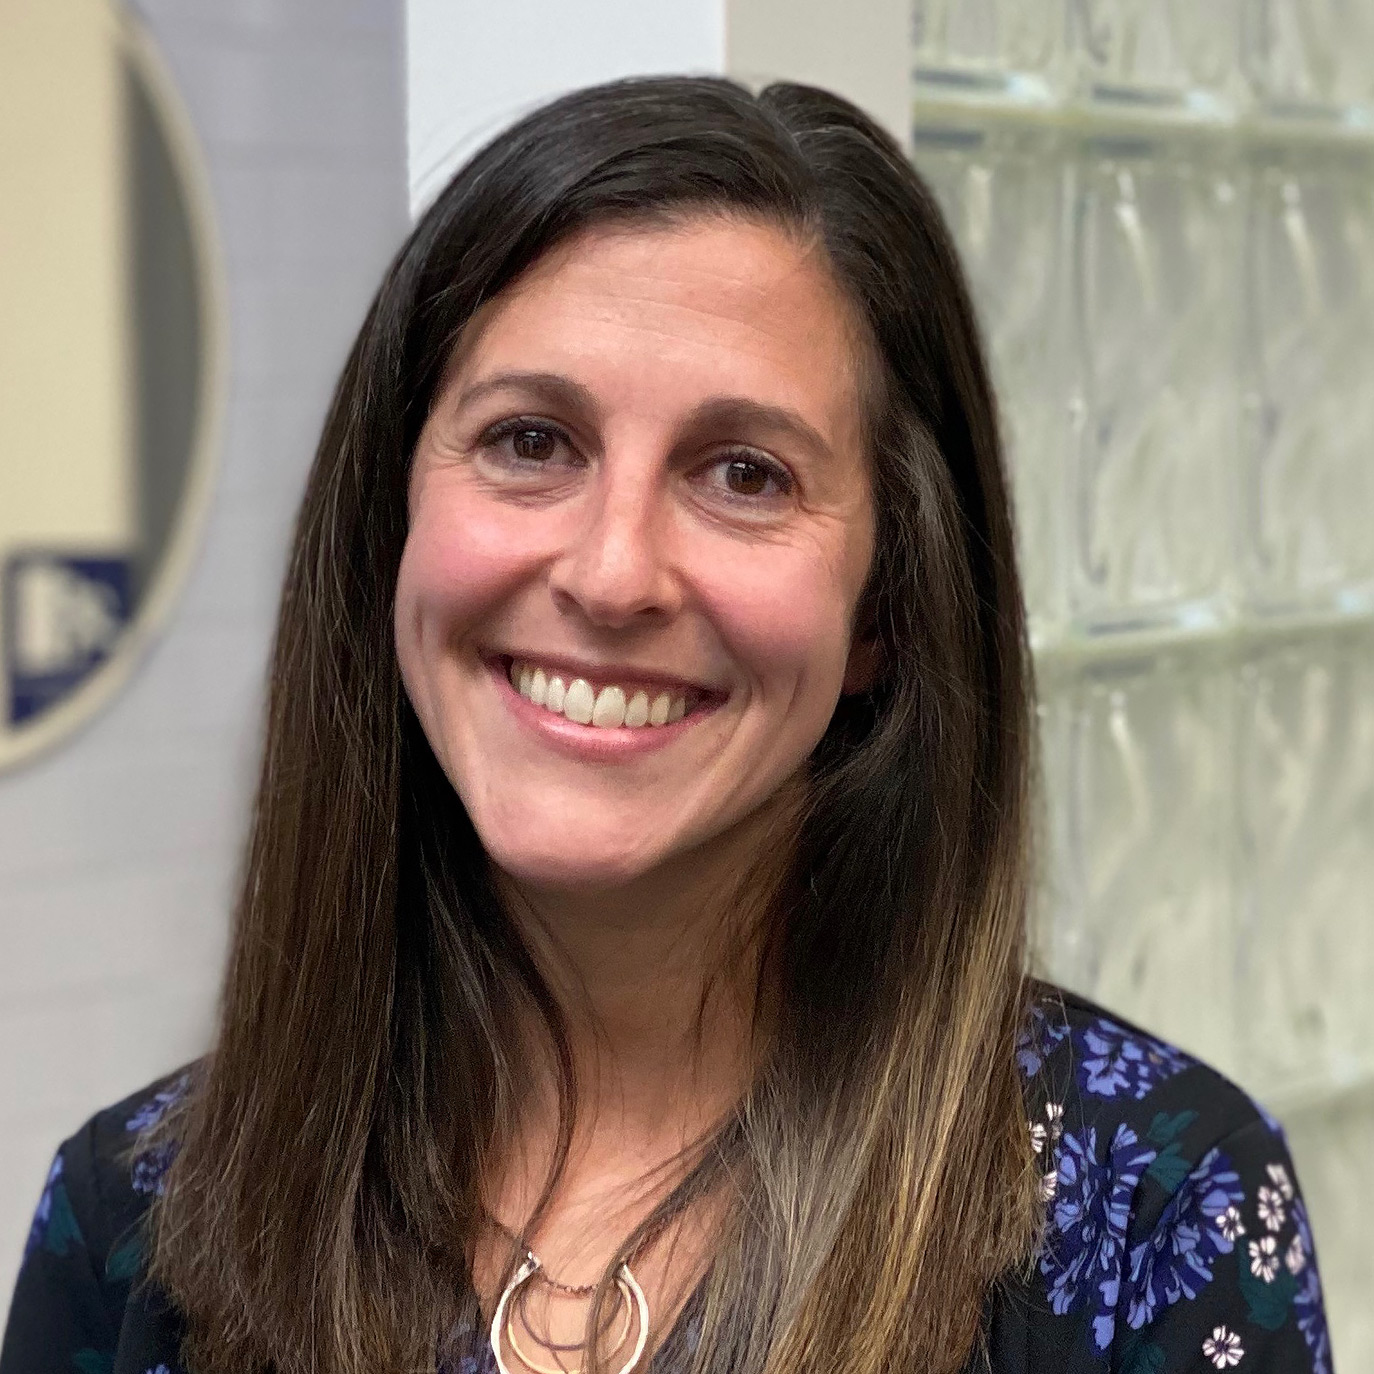 Dr Adina Wolfe